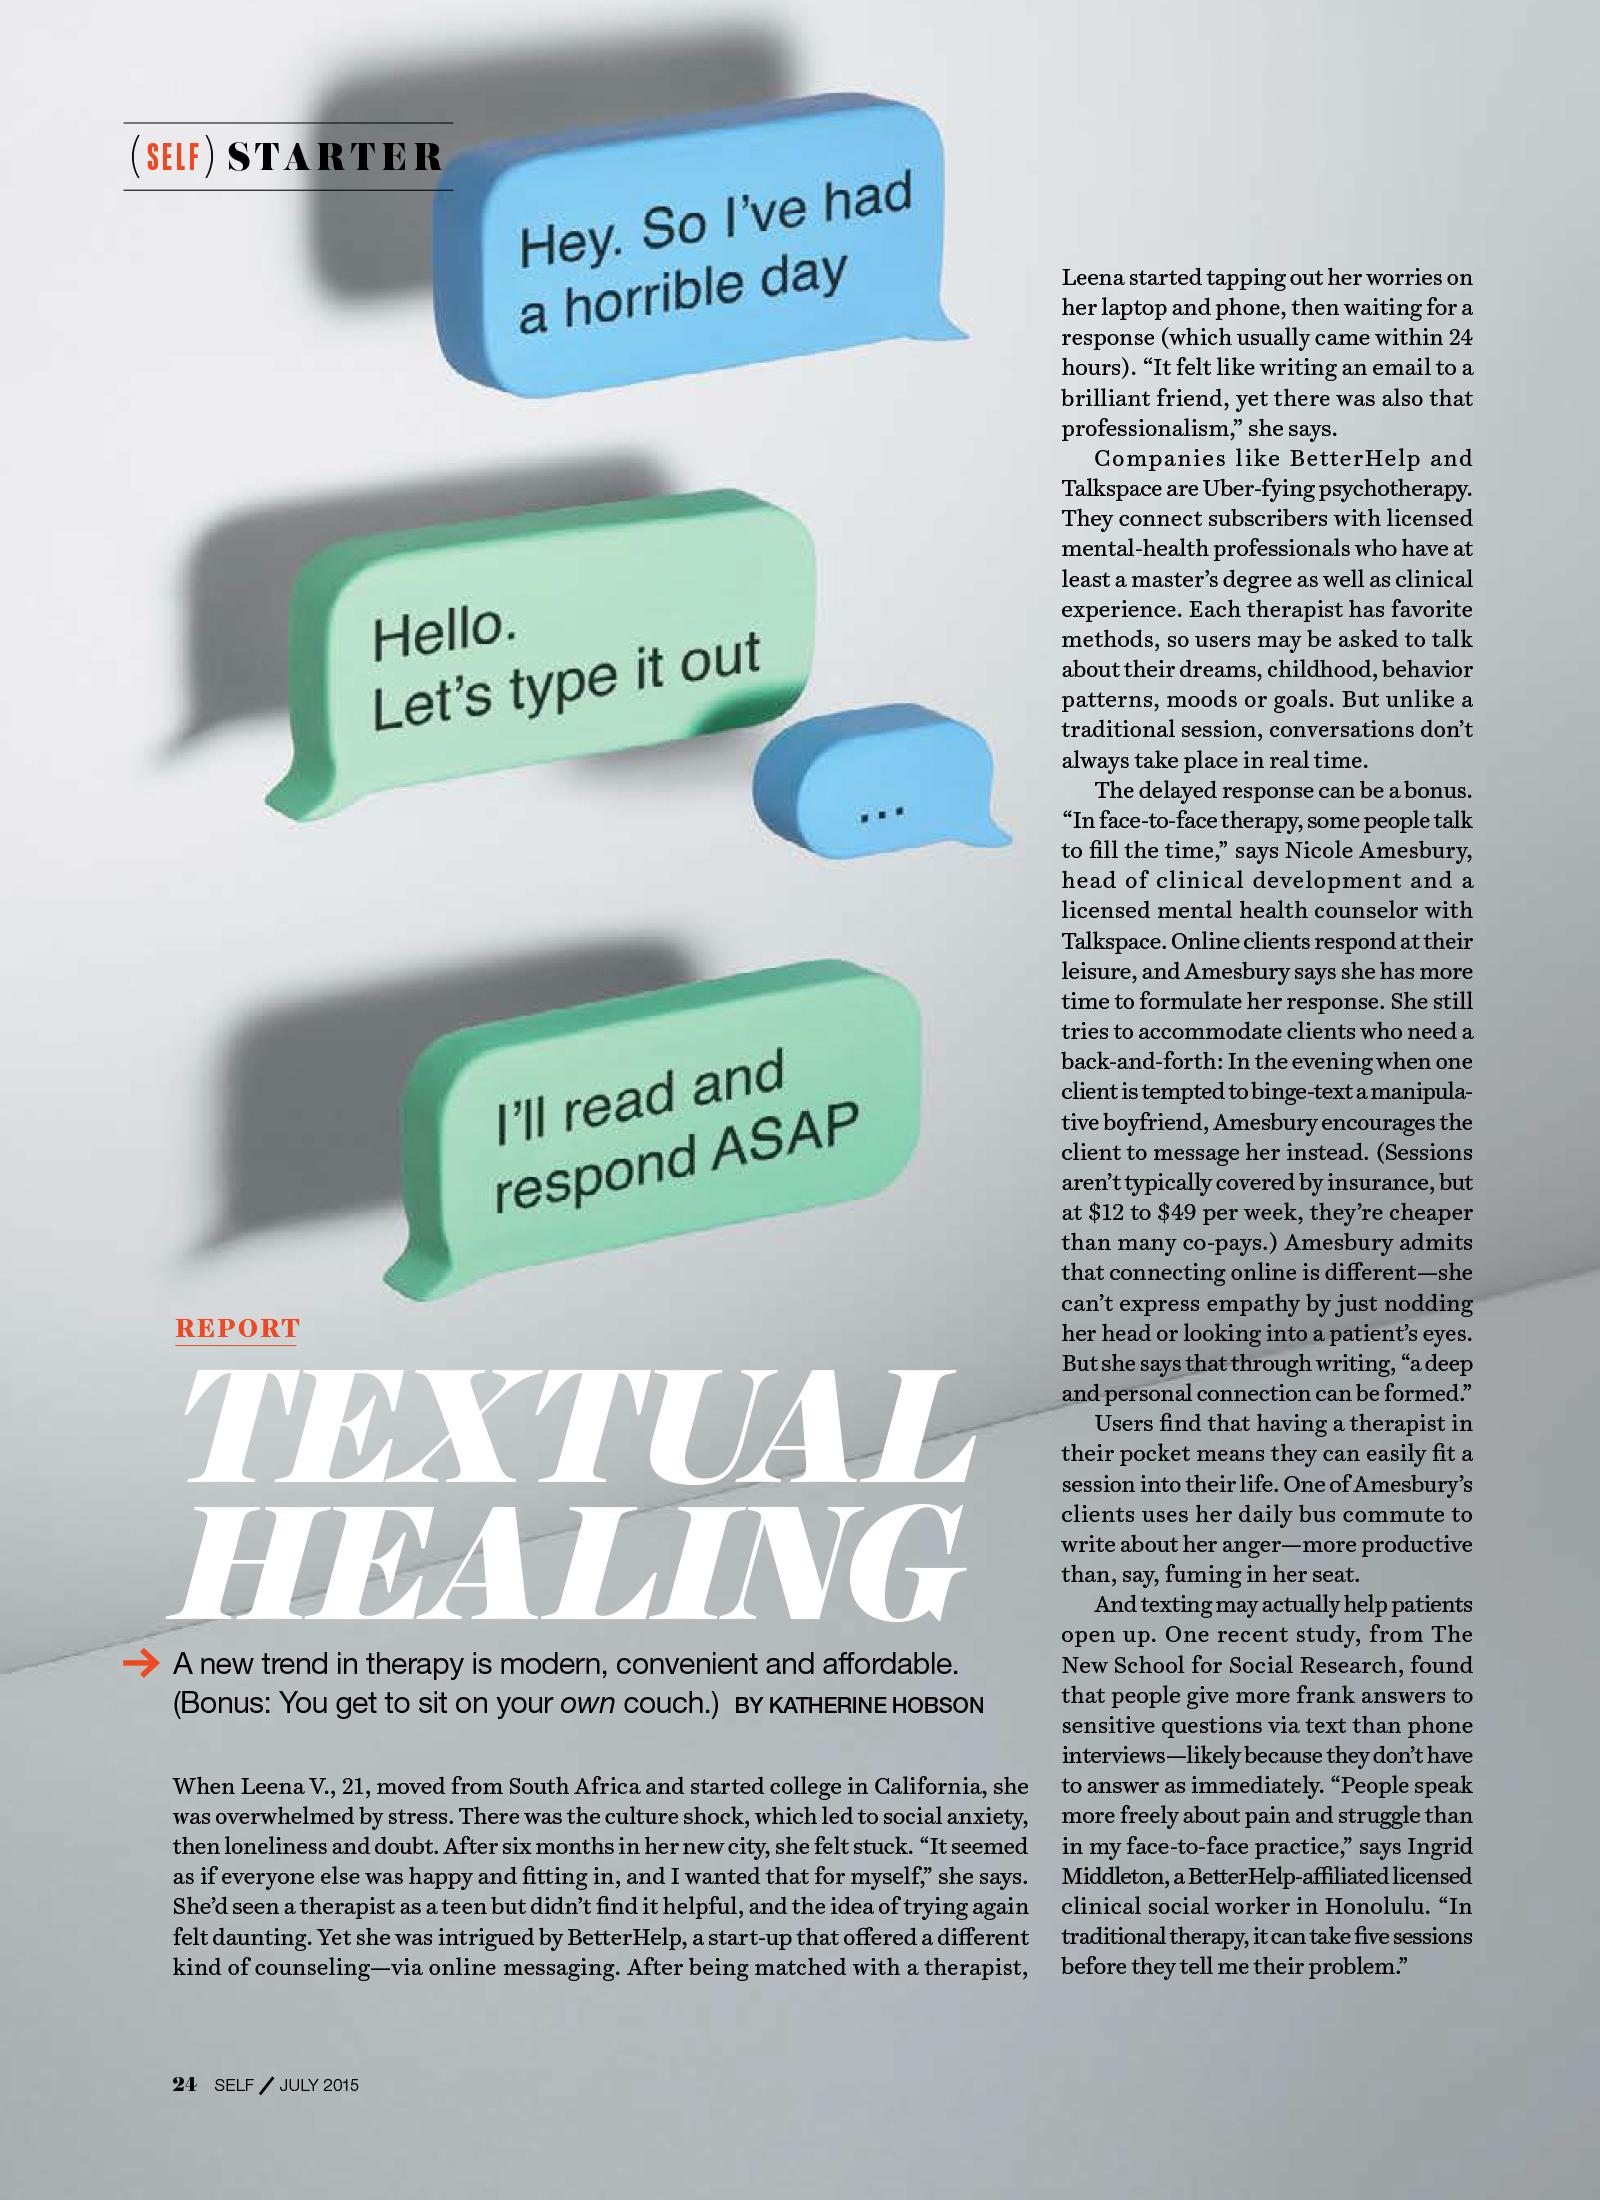 report__textual_healing-1.jpg